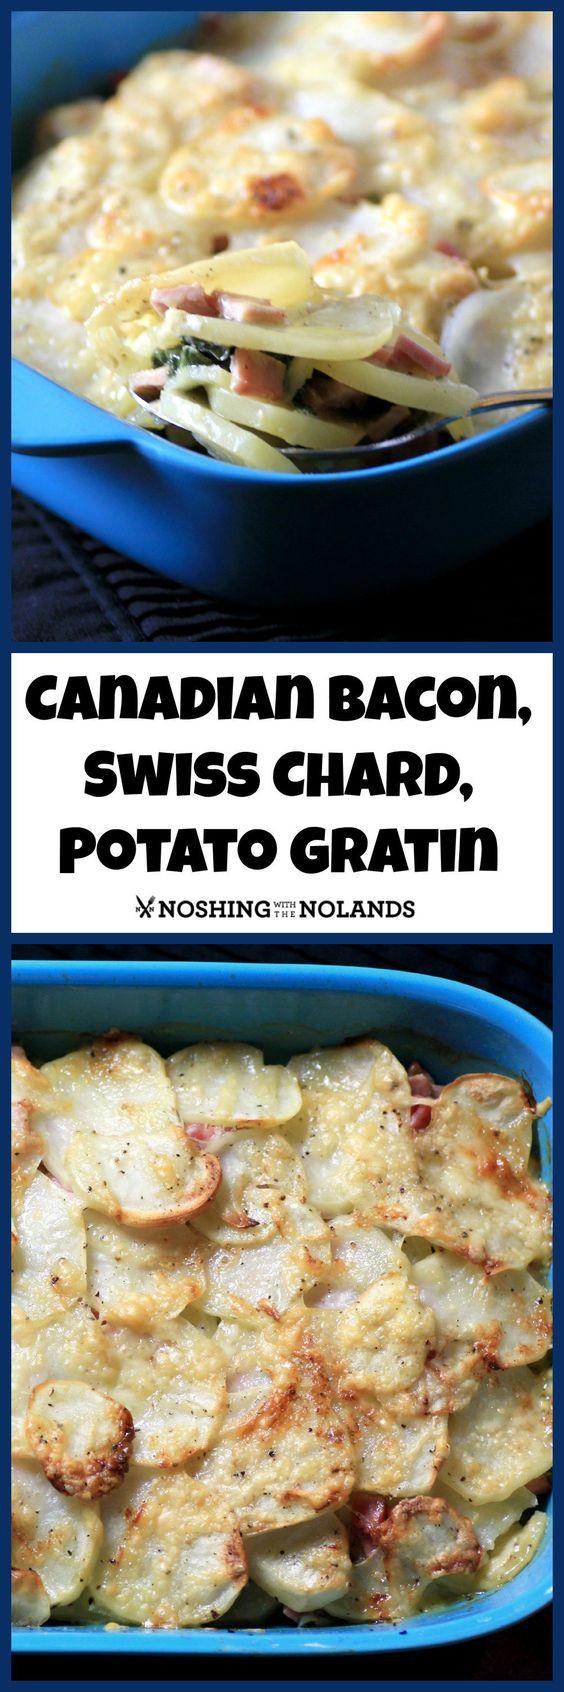 ... potatoes vegetables potatoes sweet potatoes food canadian canadian